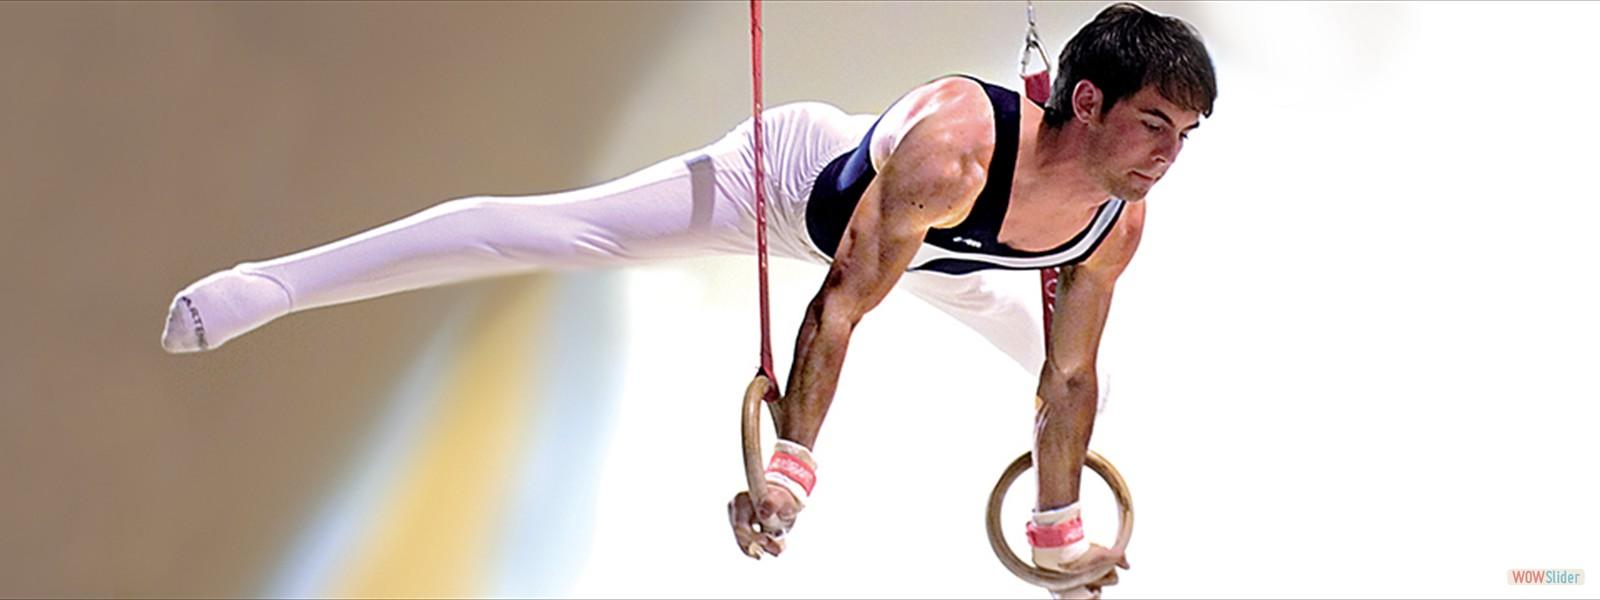 Gymnastique artistique masculine